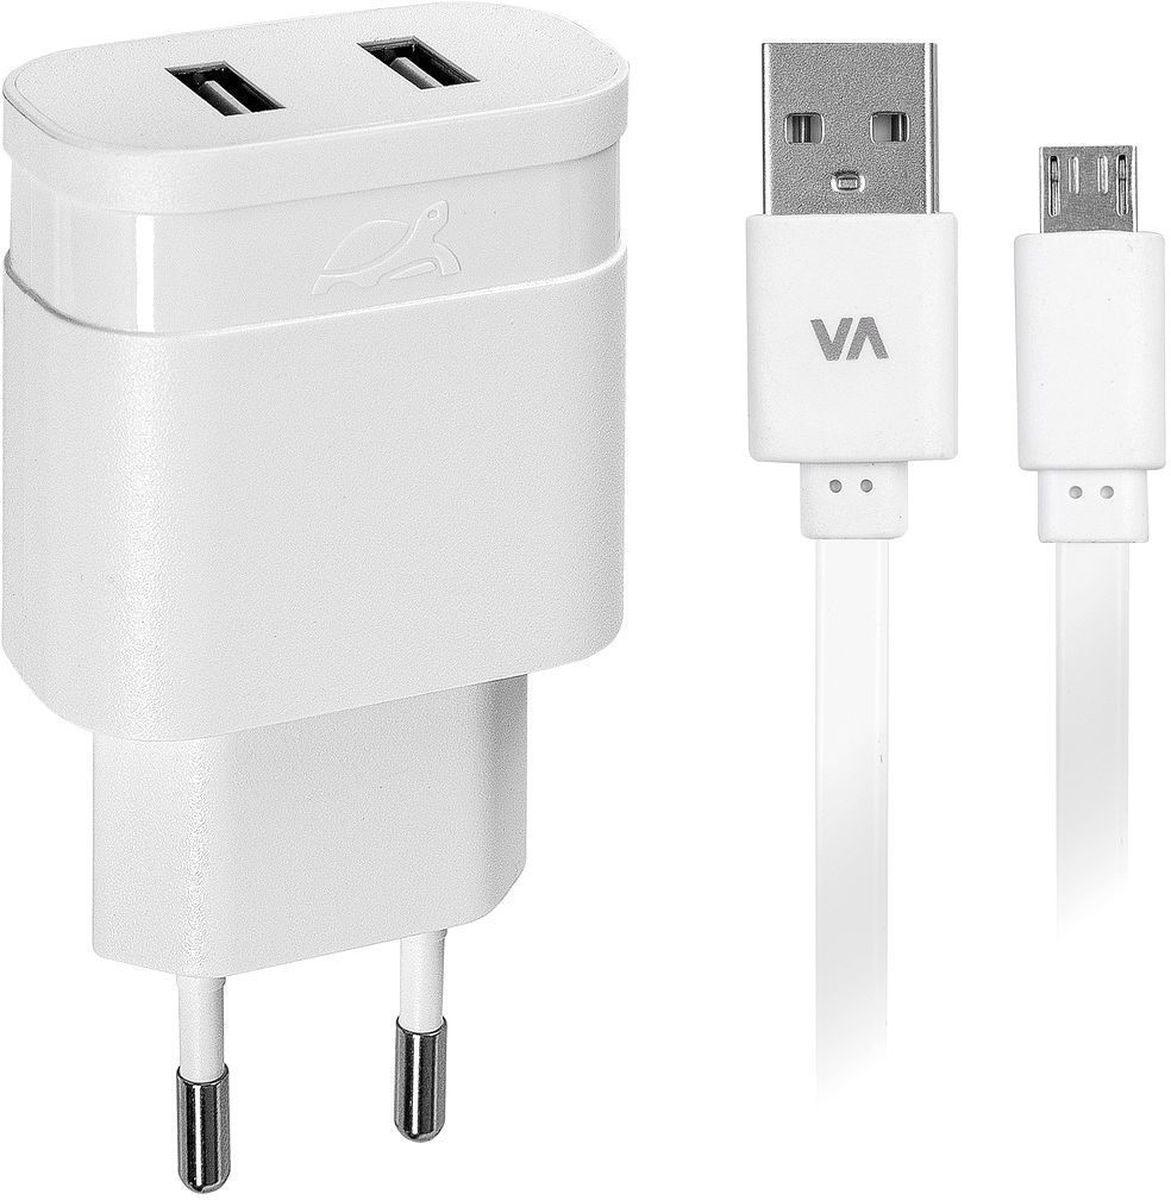 Rivapower VA4122 WD1, White сетевое зарядное устройство rivacase rivapower va 4222 wd1 2usb x 2 4a